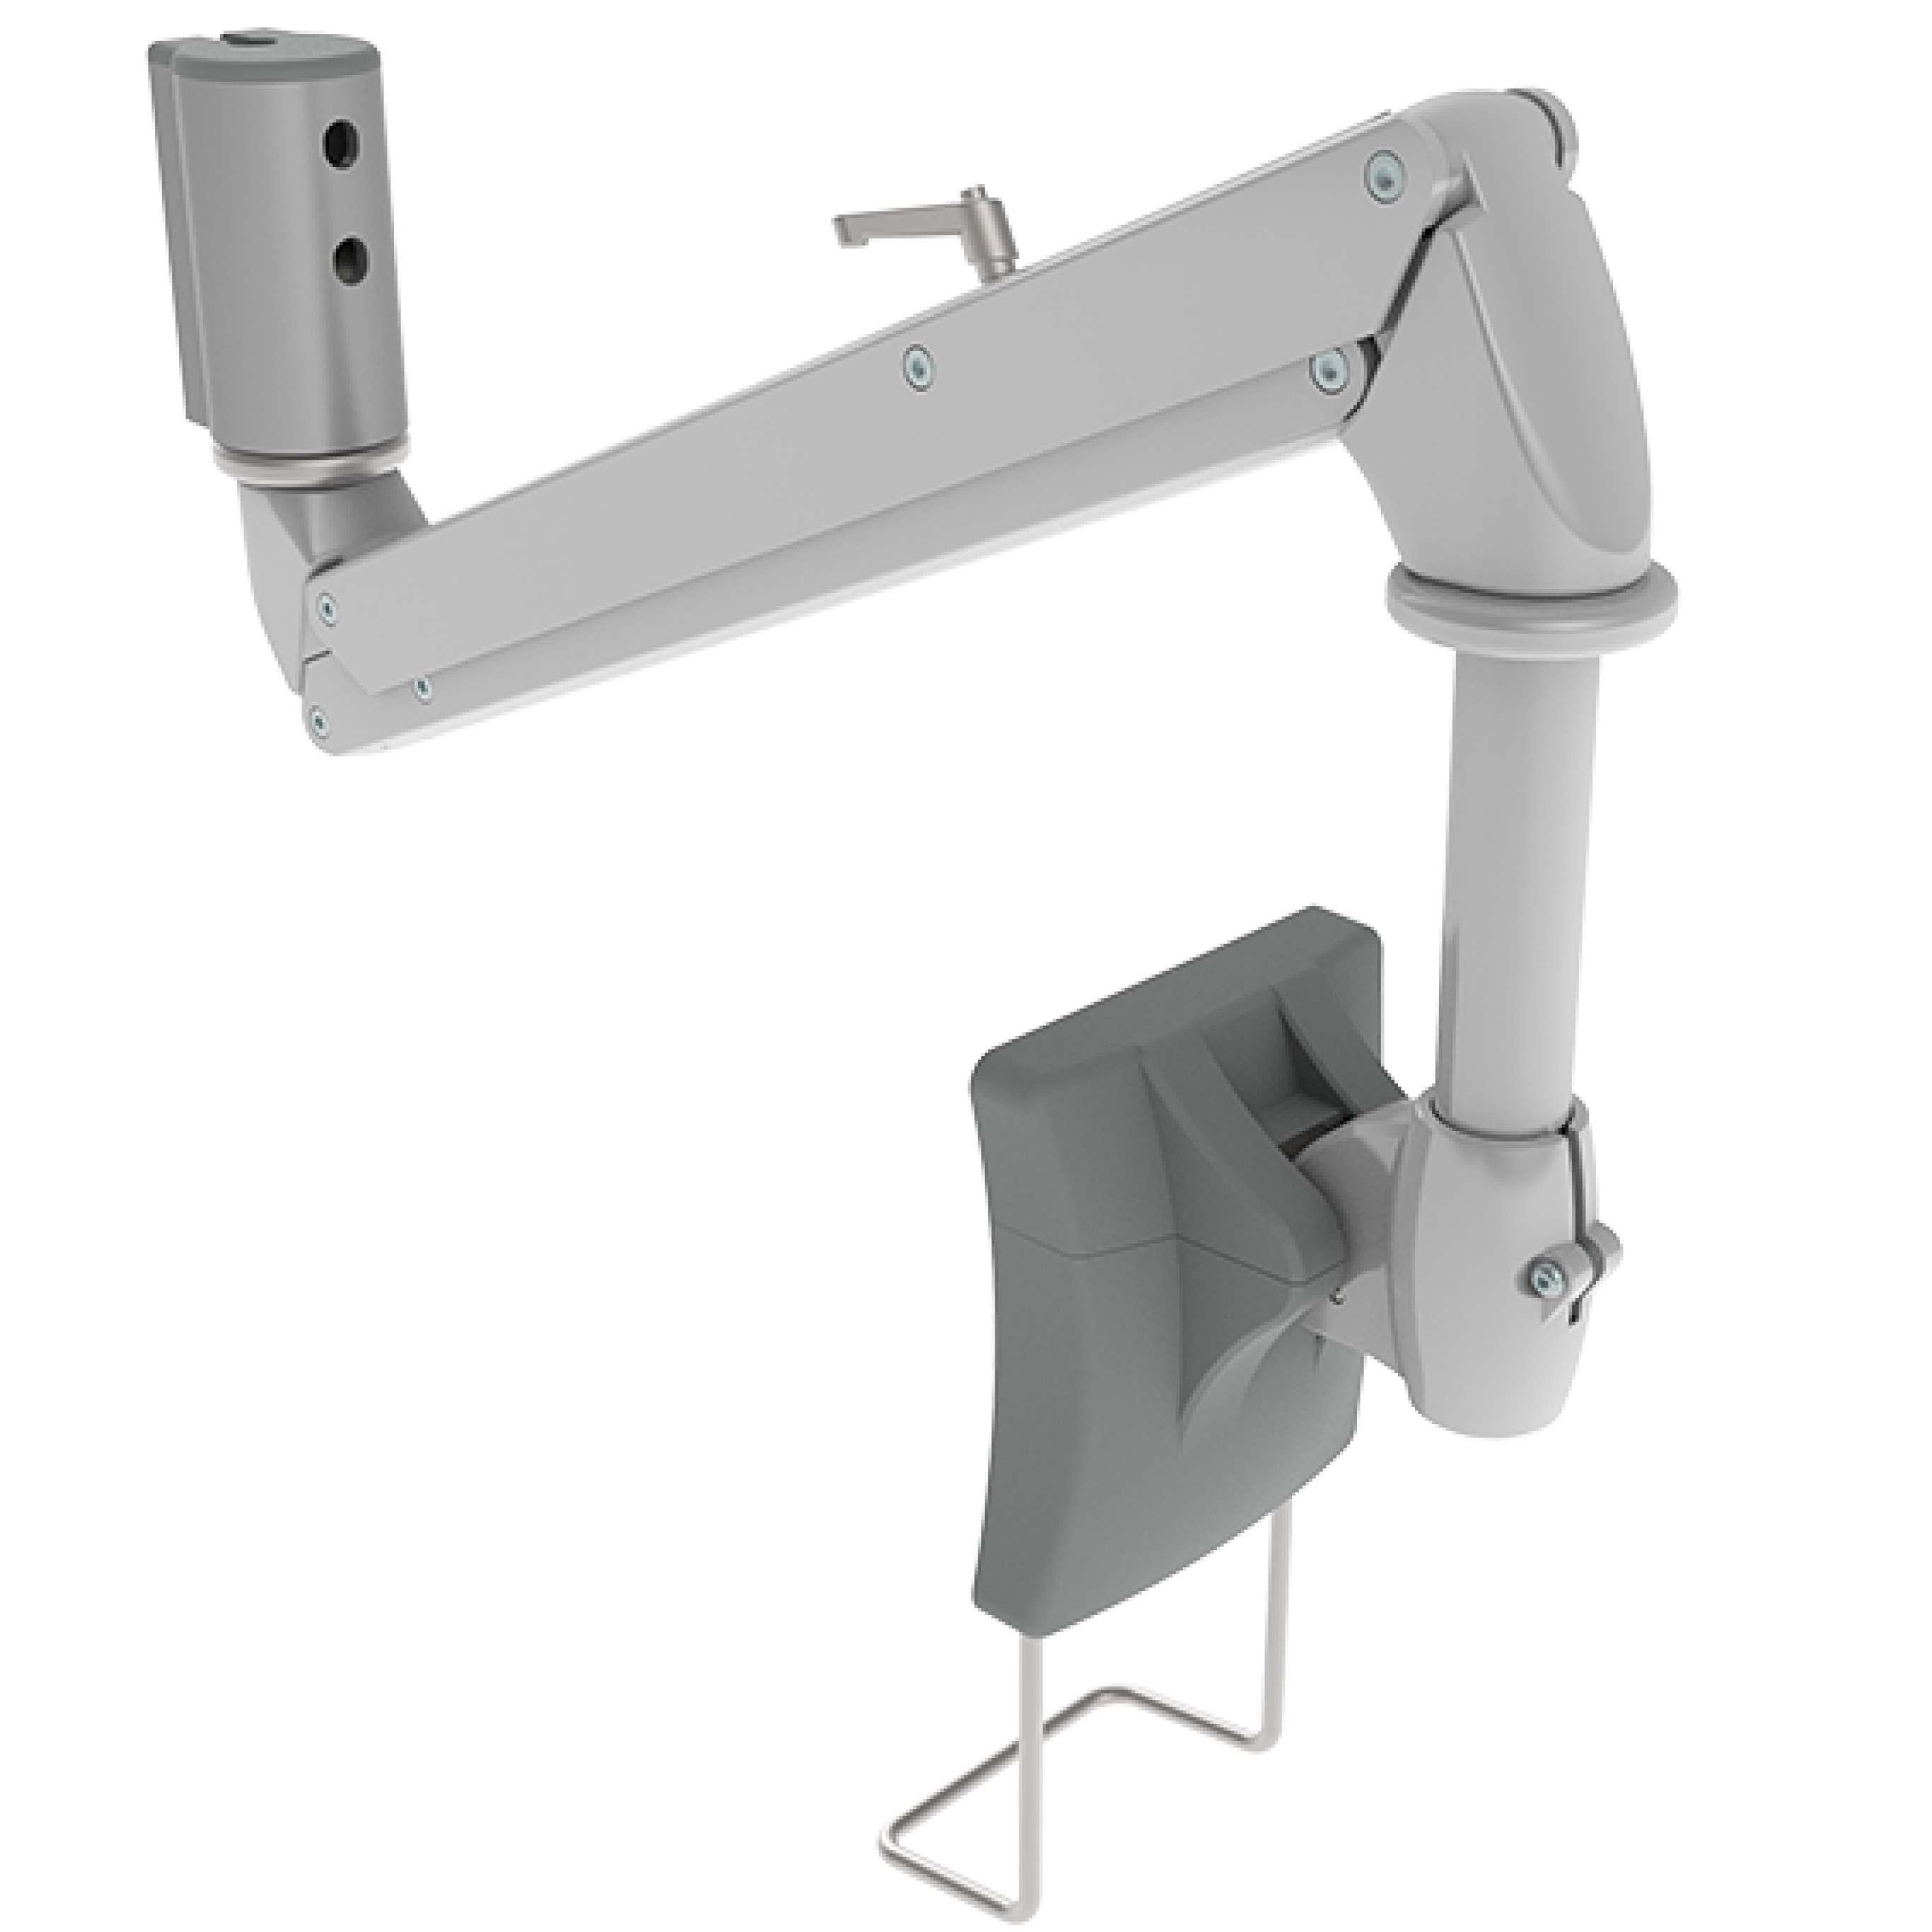 2021-09-30-FATH-pp-monitor-suspension-arm-sky